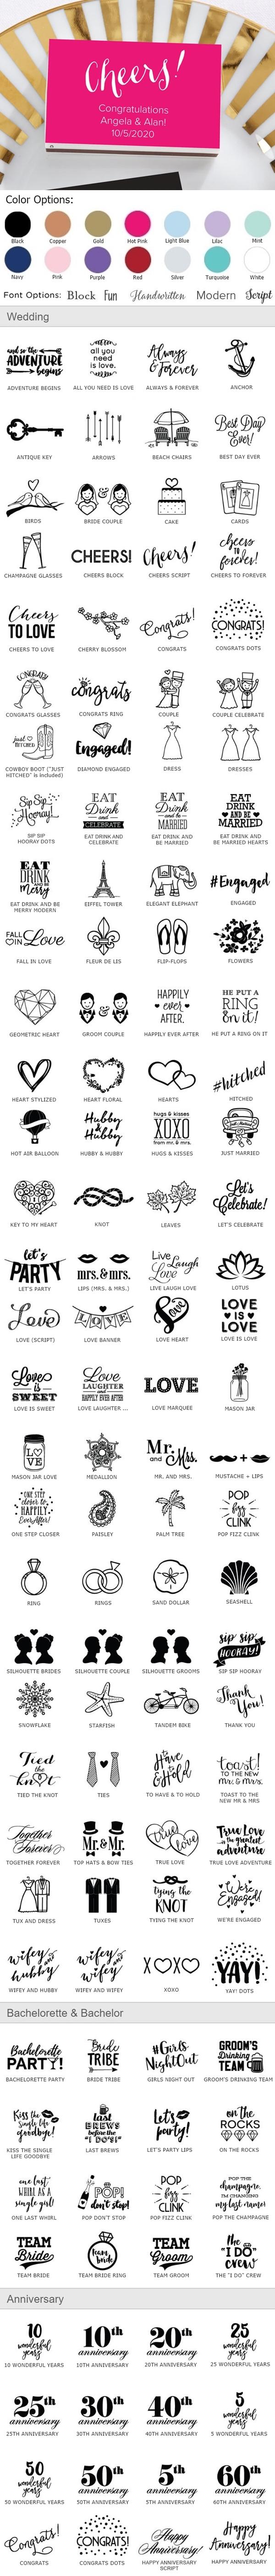 Kate Aspen Personalized White Matchboxes - Wedding Designs (Set of 50)